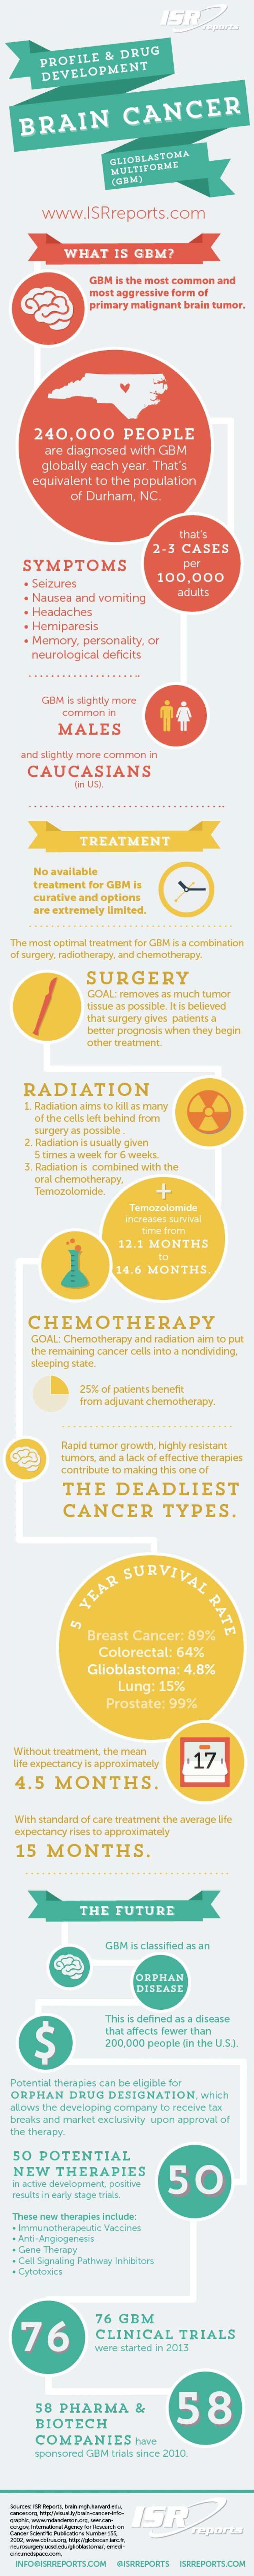 Profile & Drug Development Brain Cancer Glioblastoma Multiforme (GBM) Infographic